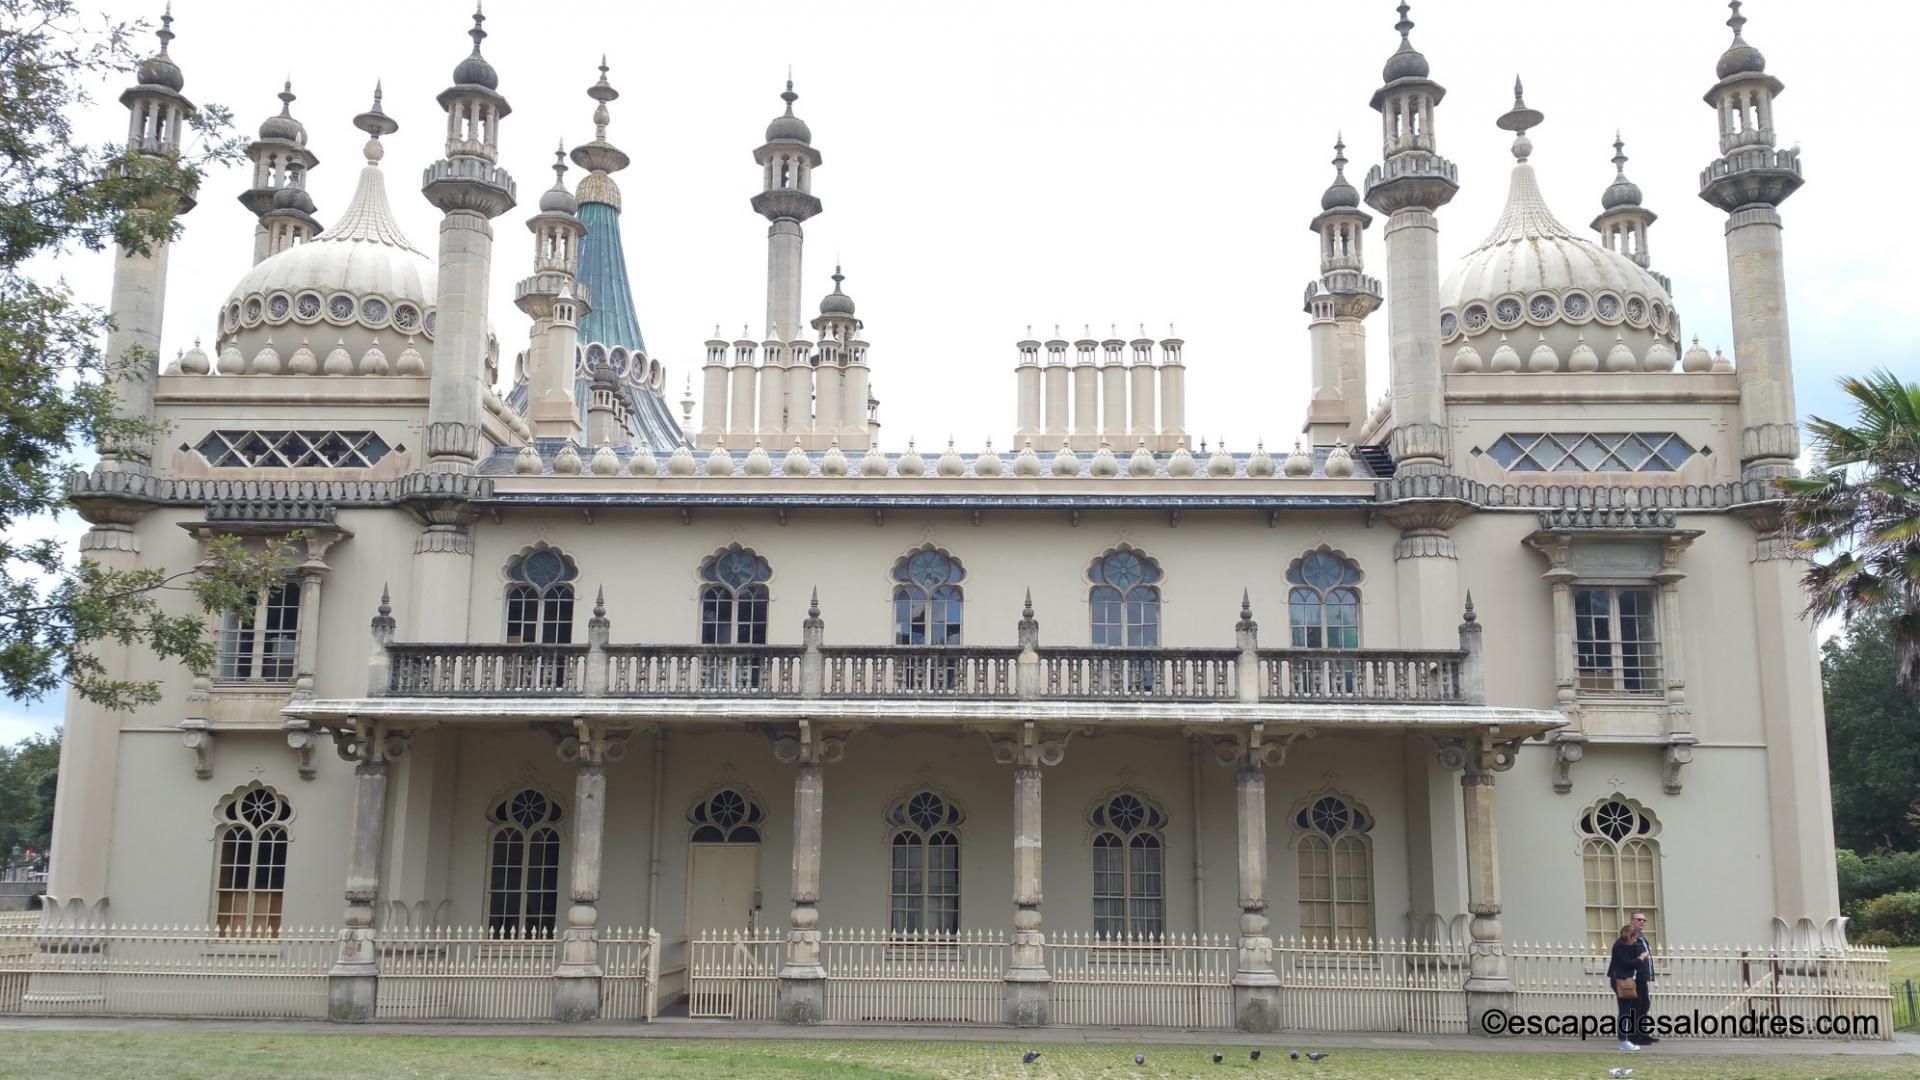 Royal pavillon Brighton